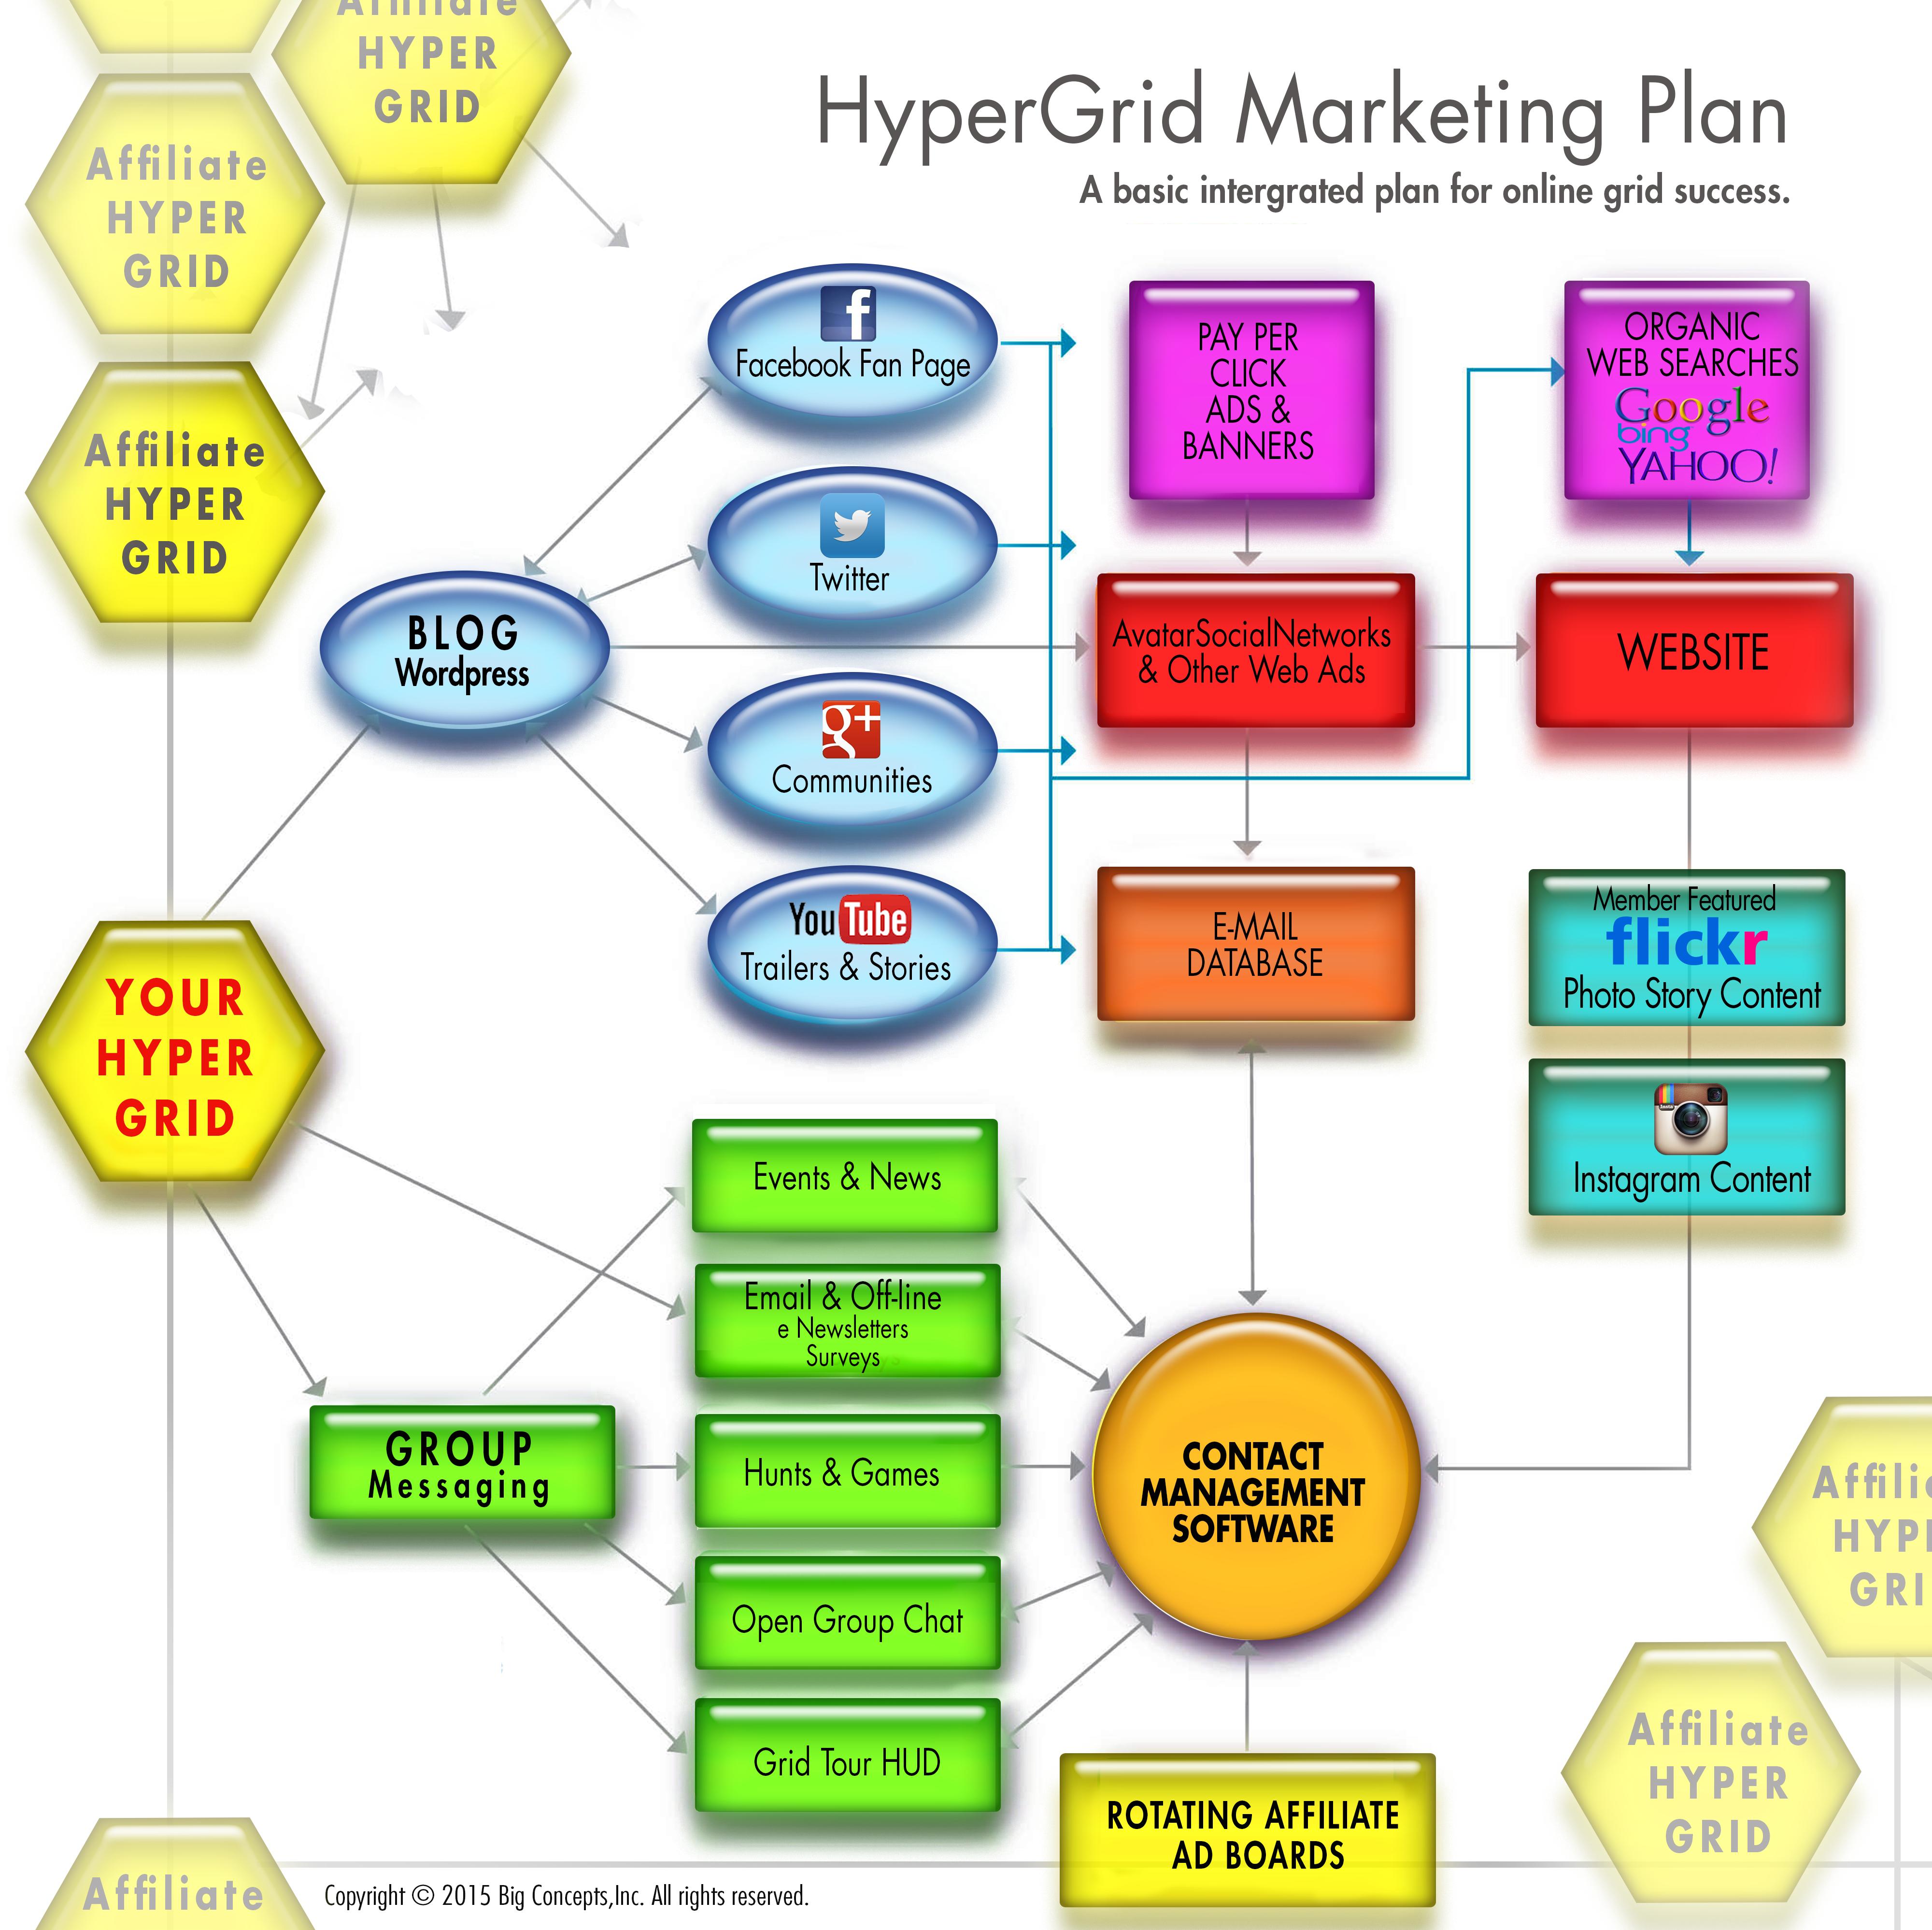 4 legs of a hypergrid marketing plan – Marketing Plan